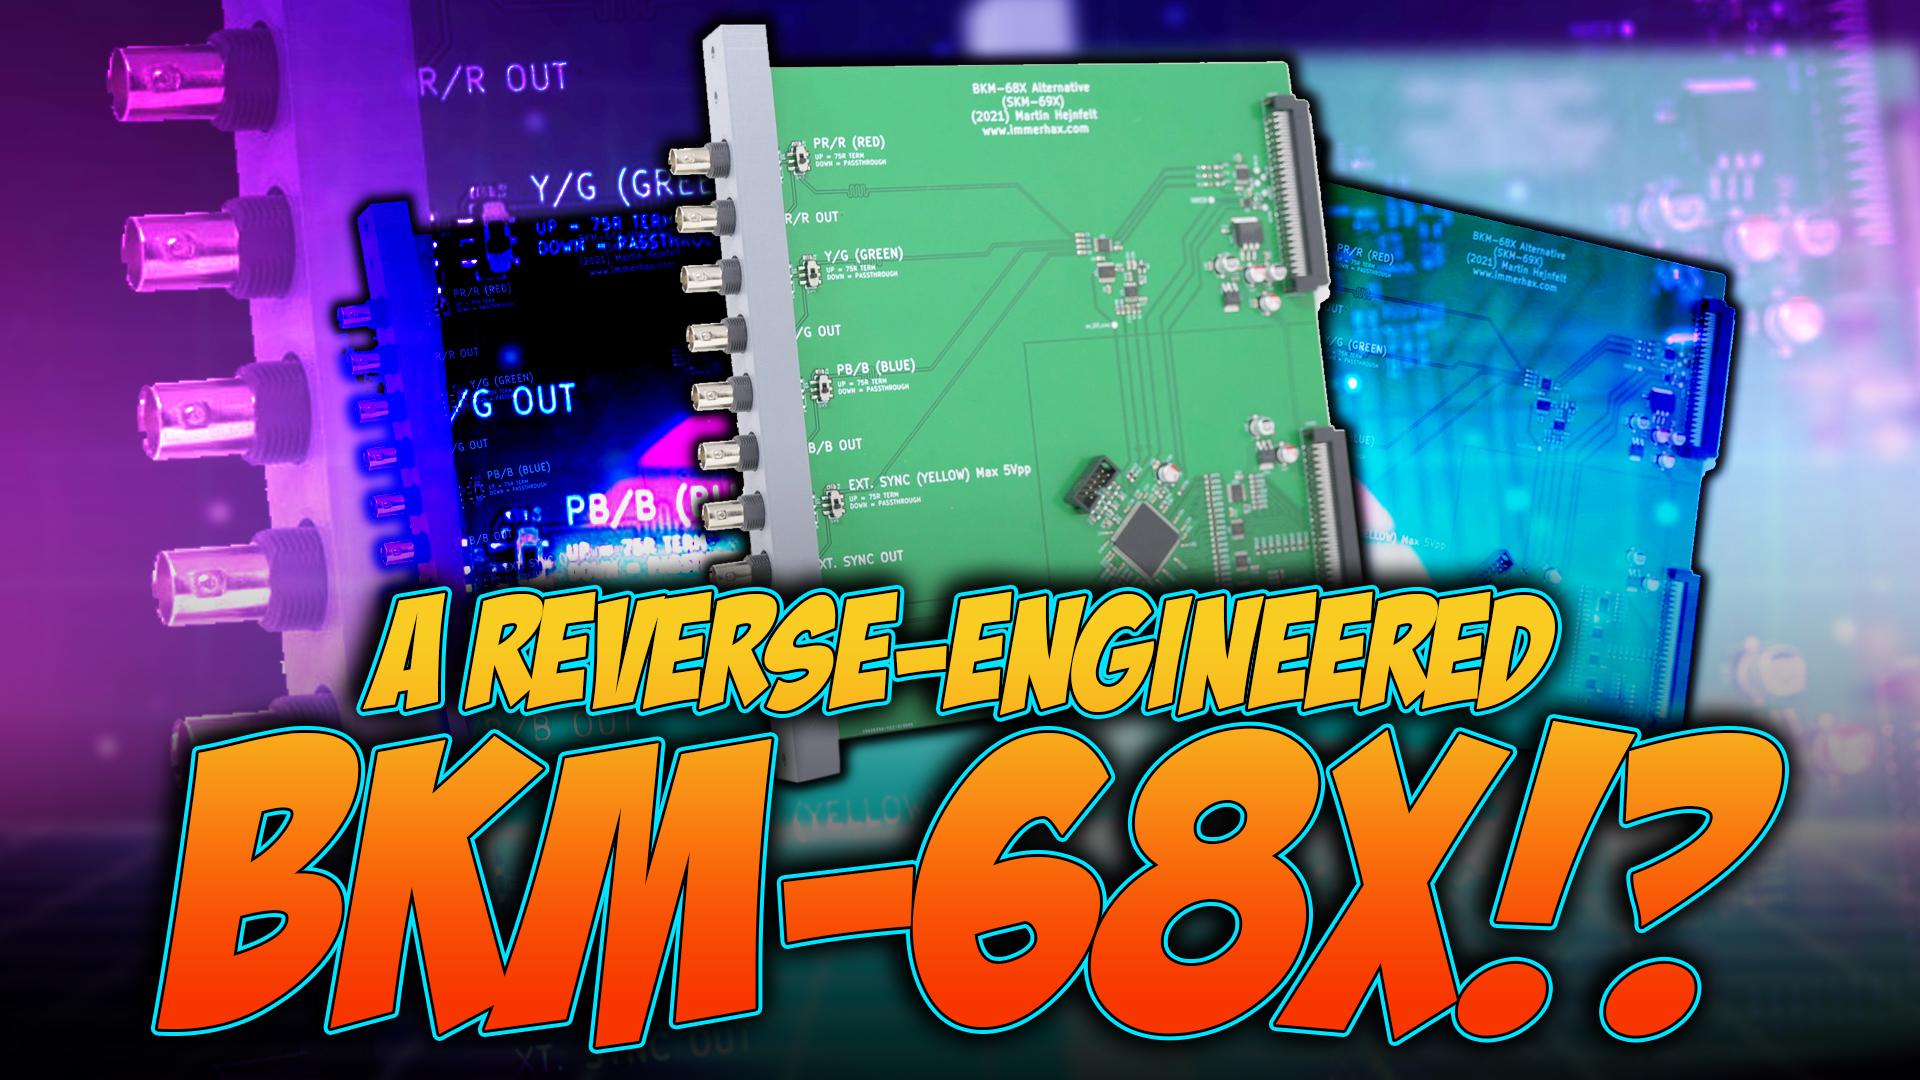 Reverse-Engineered BKM-68x